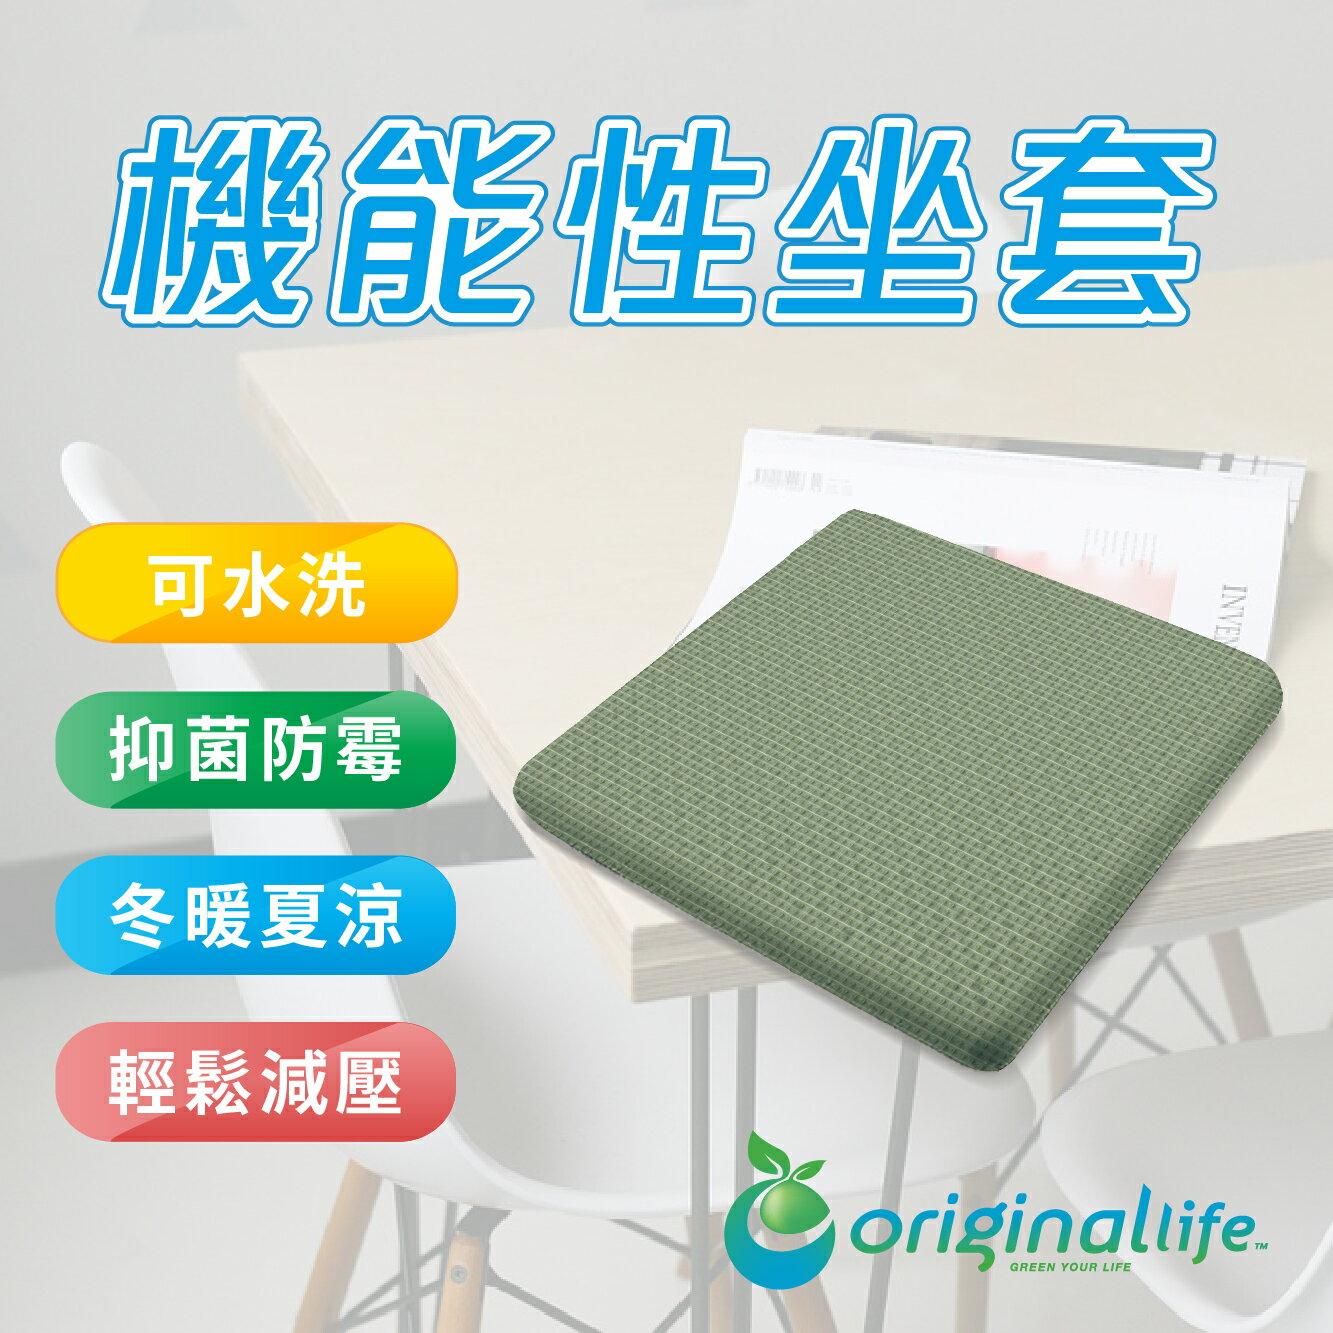 【Original Life】★健康機能沙發坐墊/坐套★50*50cm★